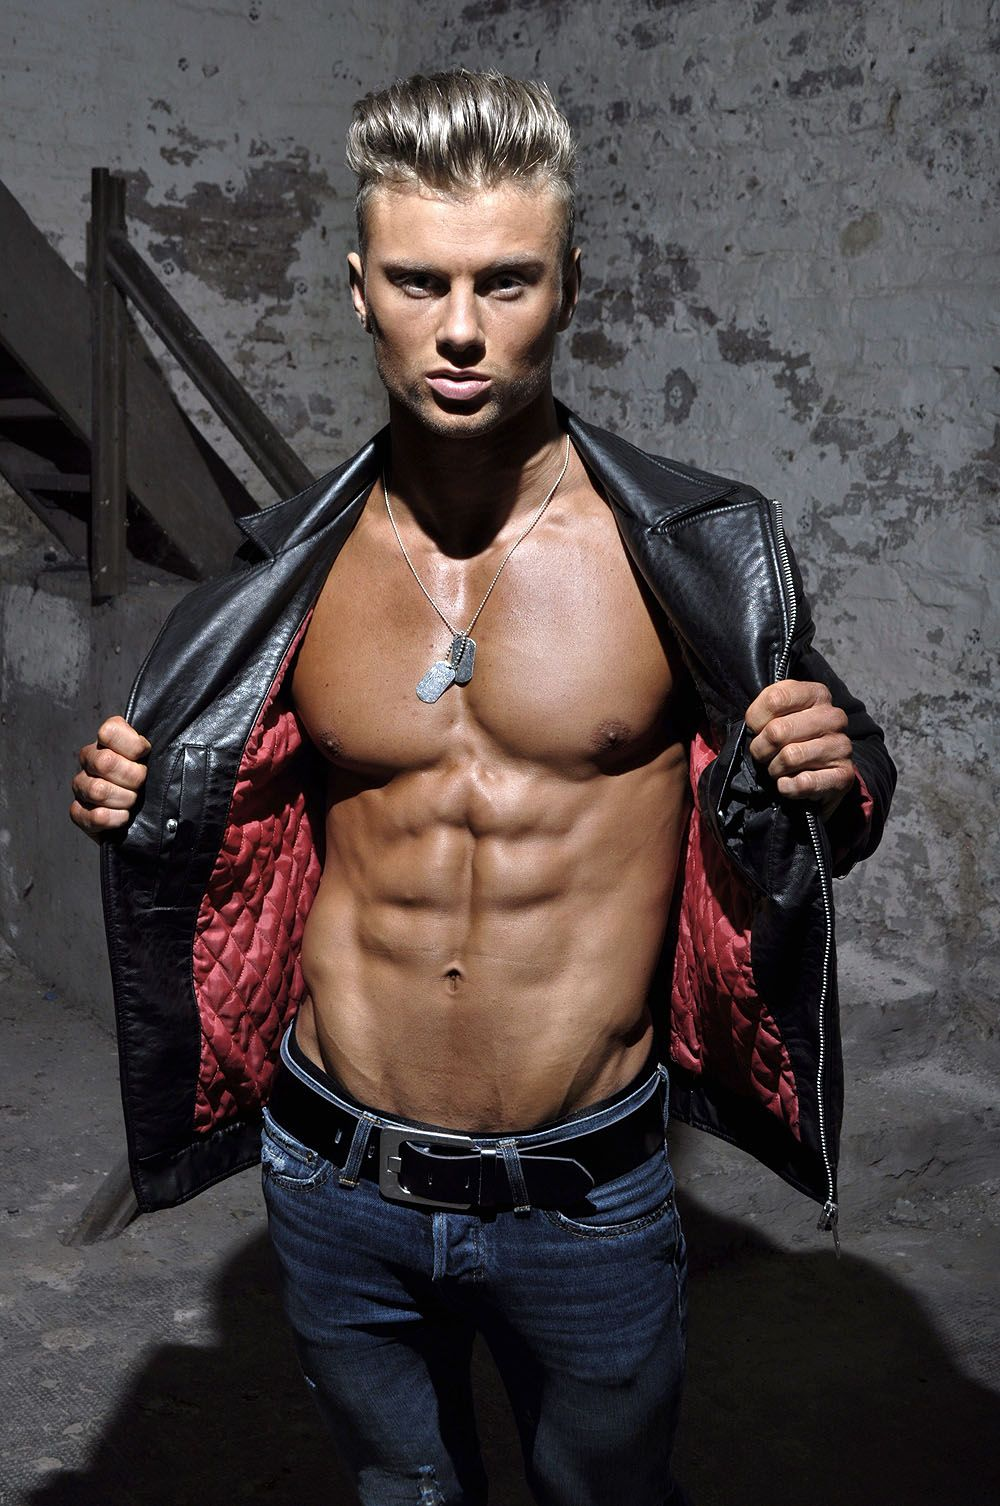 TeeJott-Fitness-Model Blacksupps by TeeJott 2015; more ...